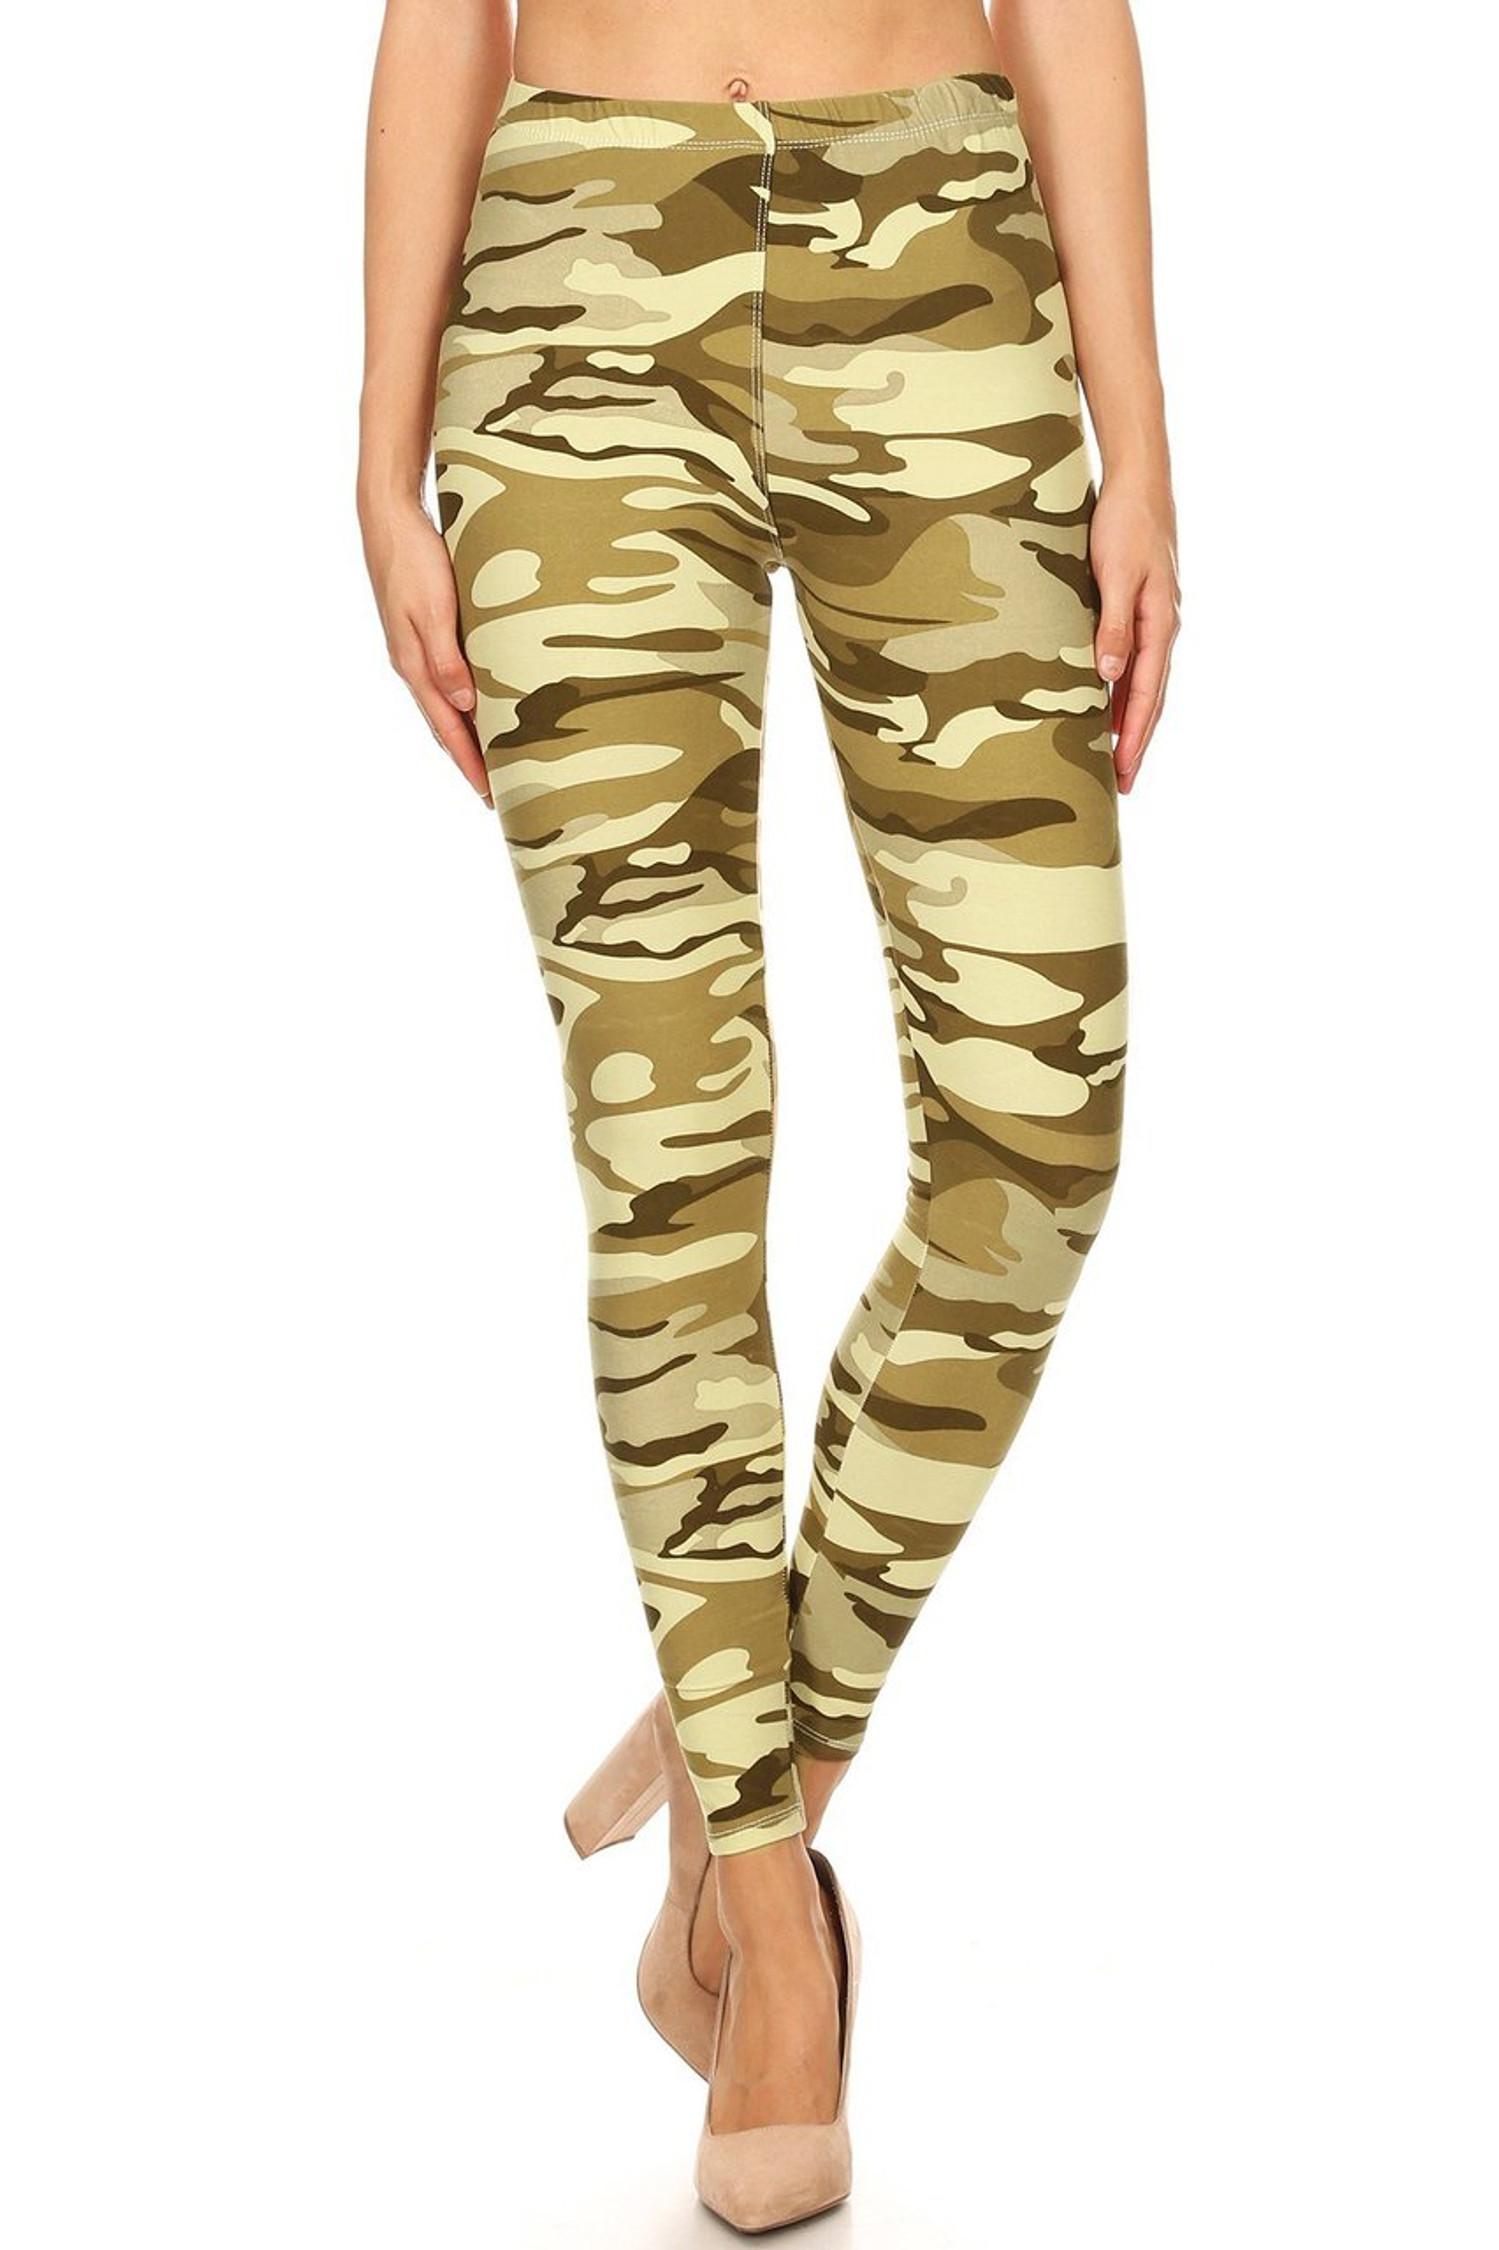 Brushed Light Olive Camouflage Leggings